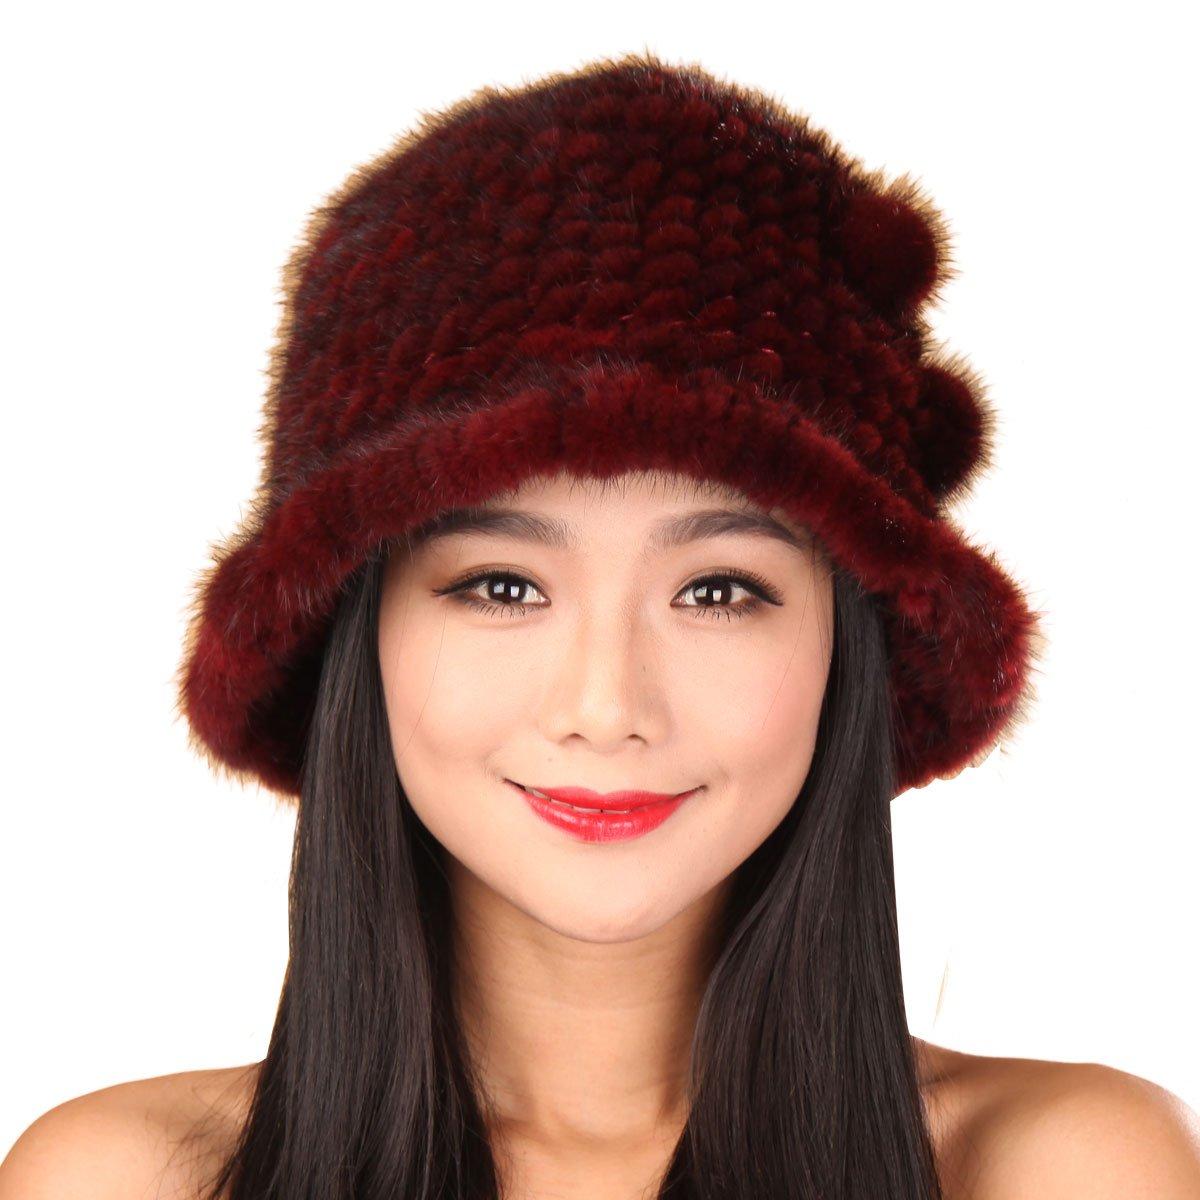 URSFUR Women's Mink Fur Floppy Hats Multicolor (Burgundy)